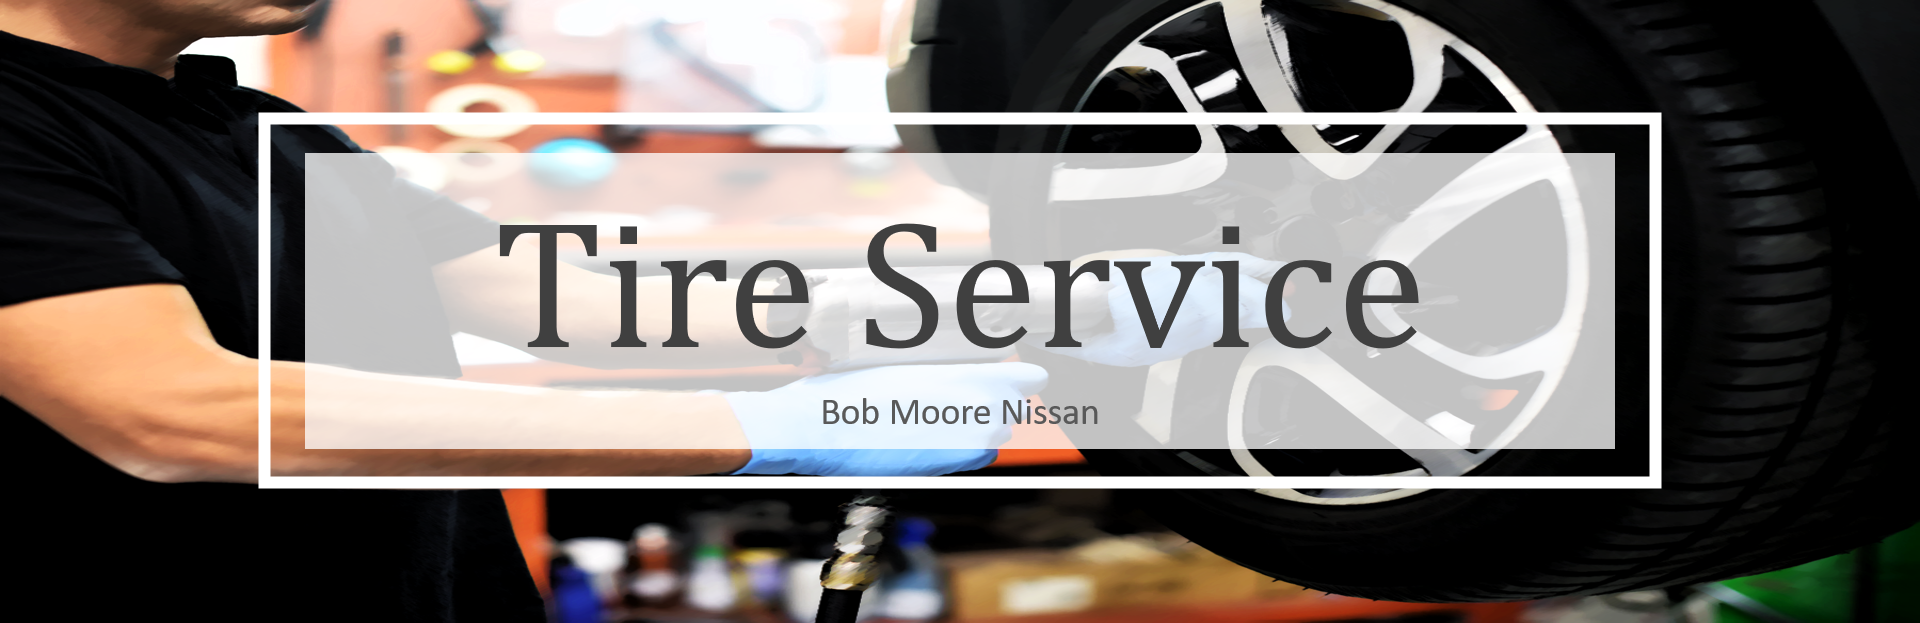 Bob Moore Nissan Tire